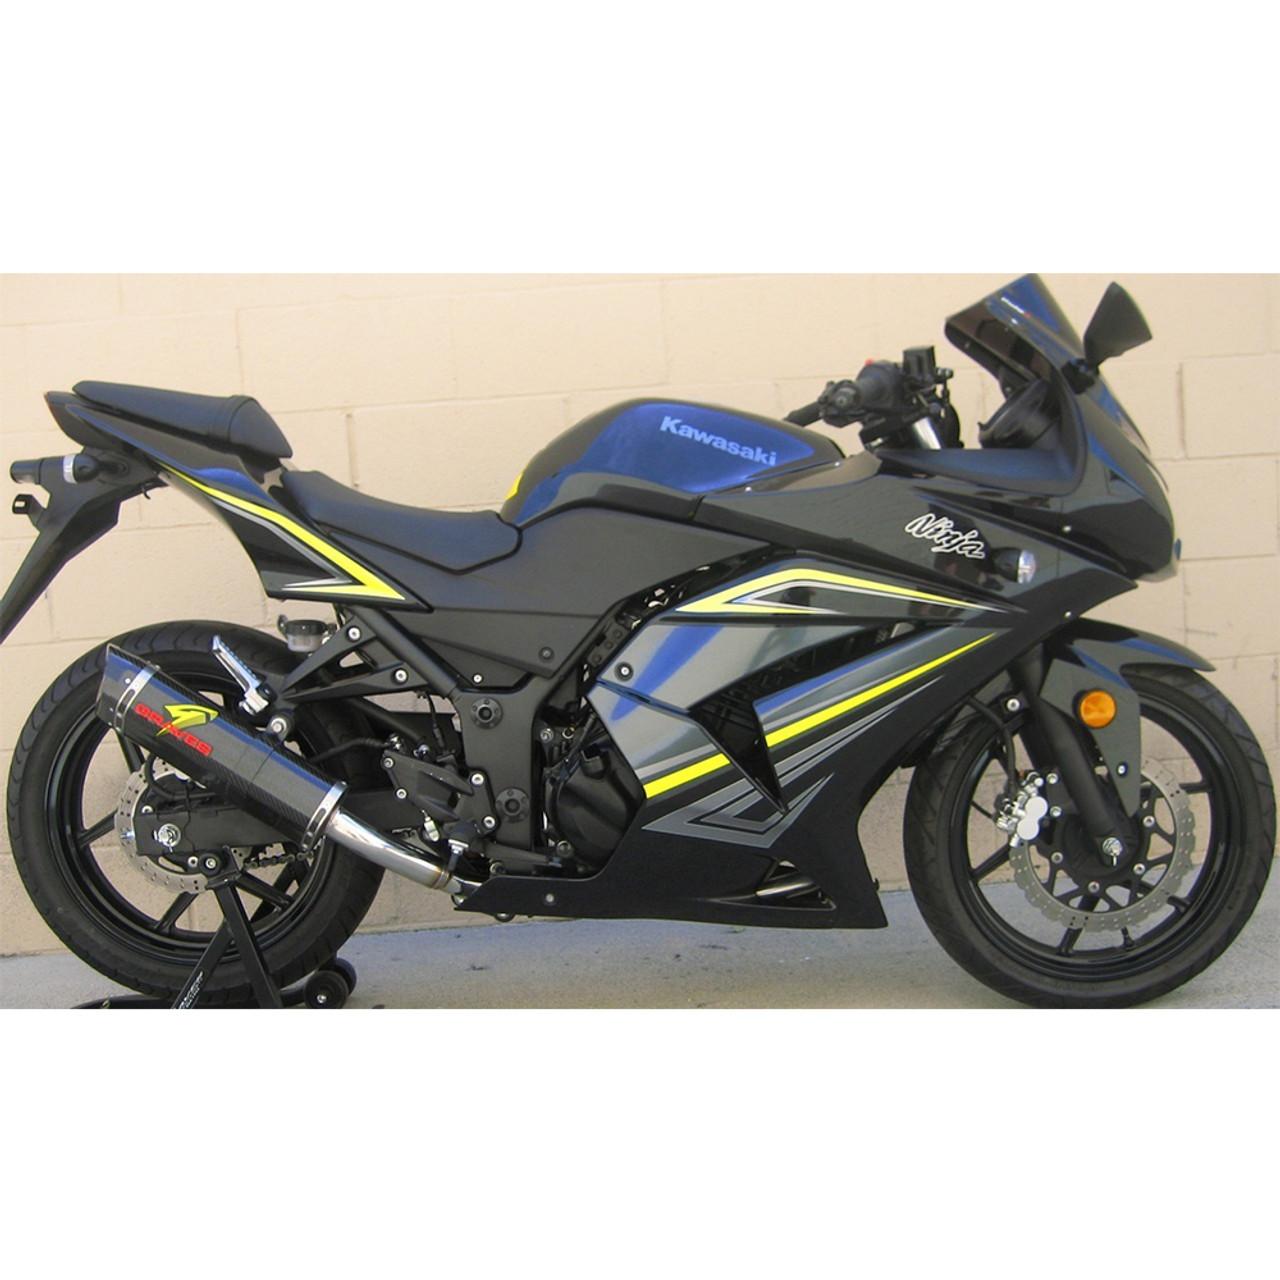 Graves Motorsports Kawasaki Ninja 250r 10 12 Full Exhaust System